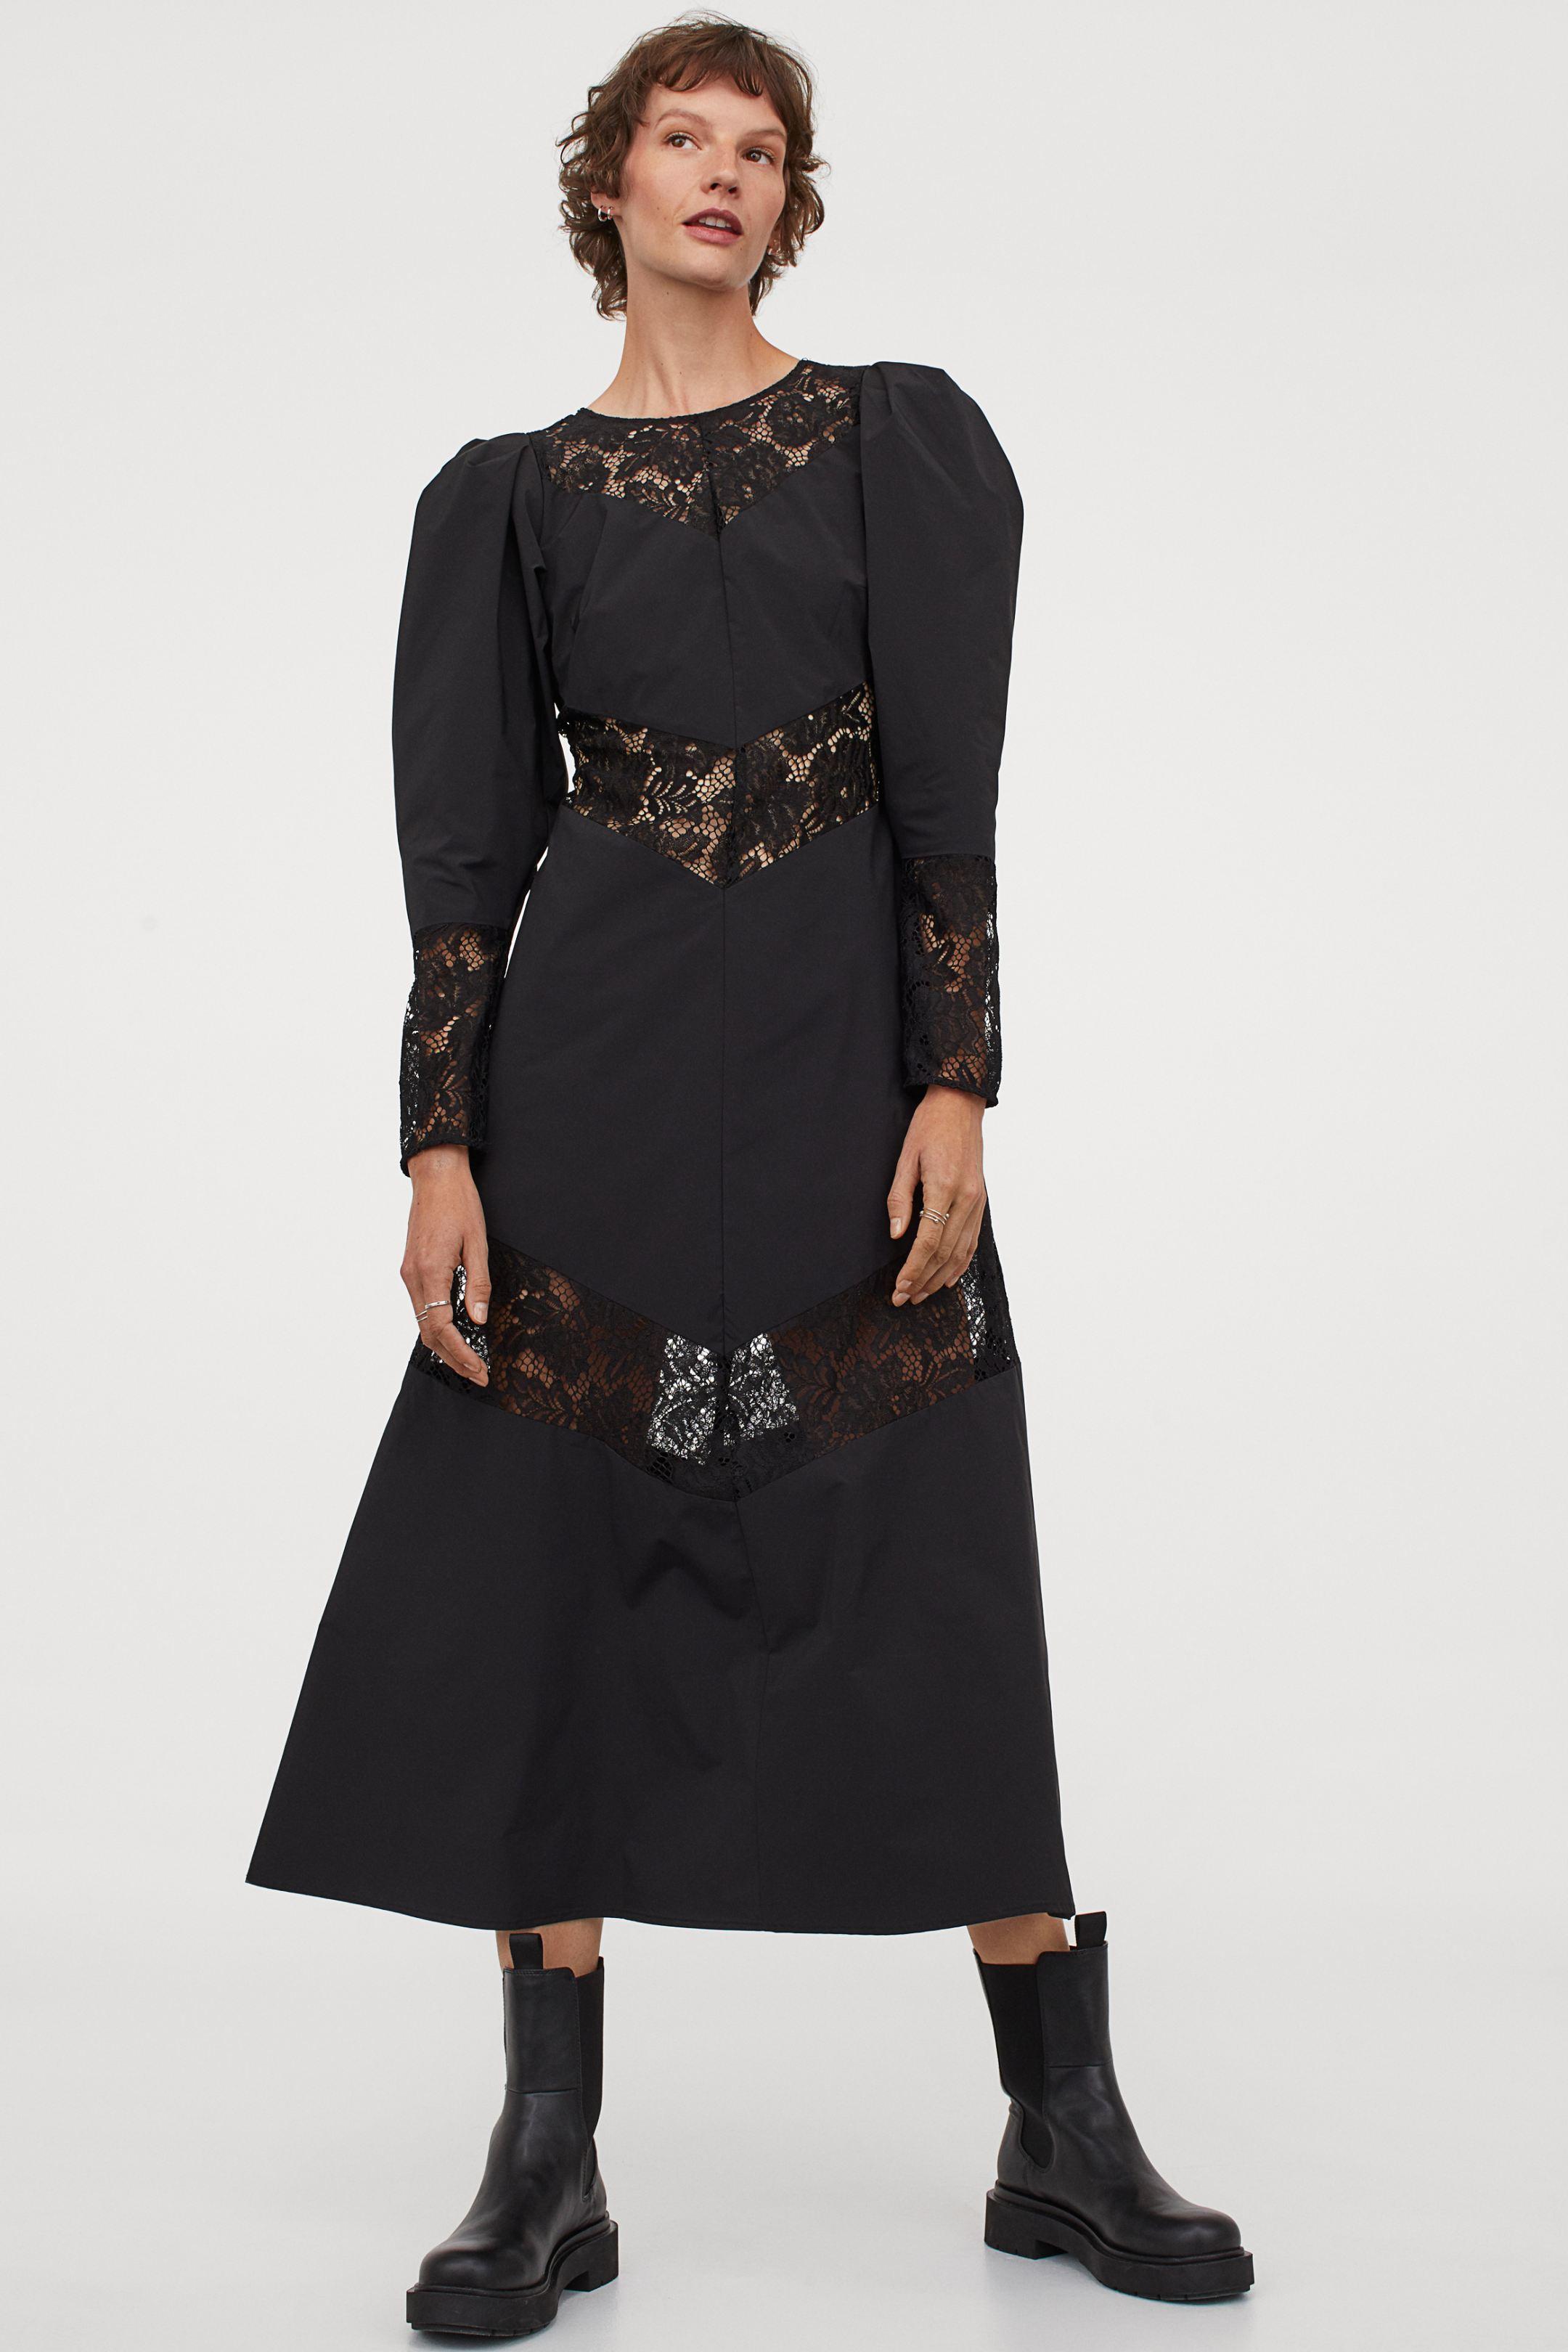 Vestido negro con detalle de encaje